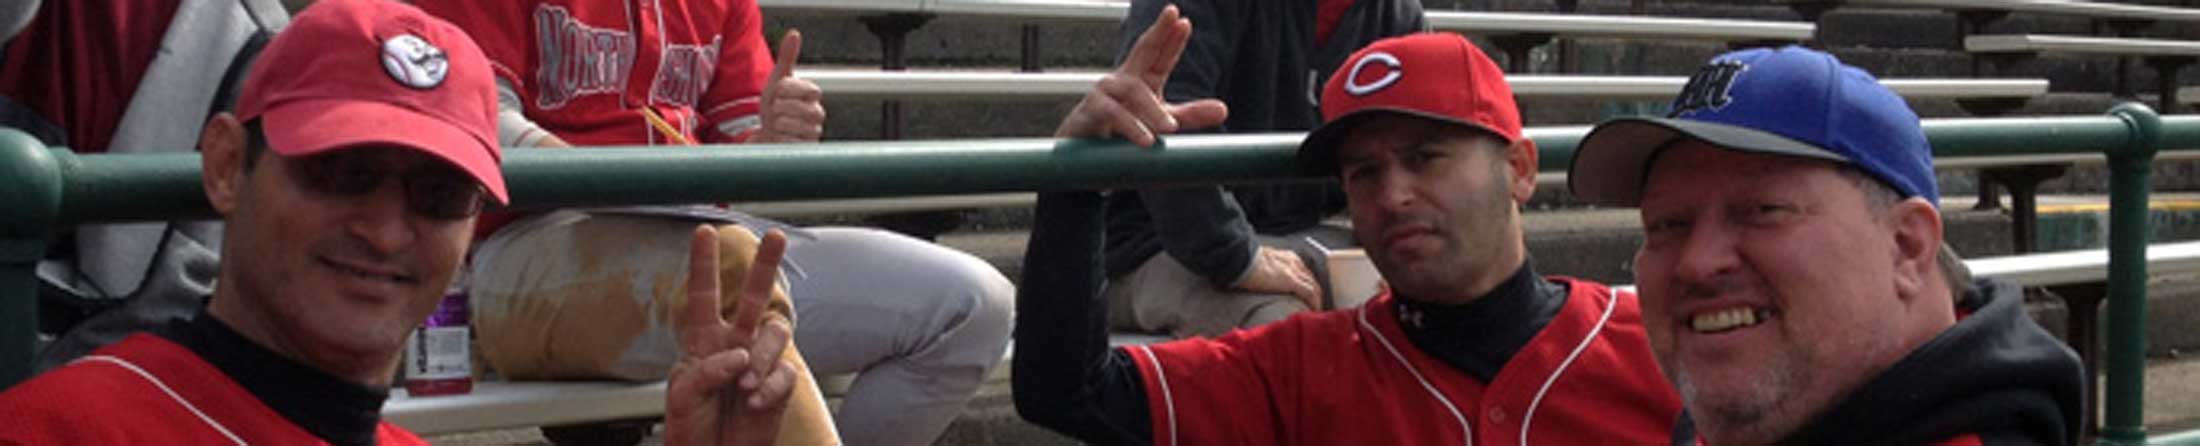 Paul Harrington, BABL baseball - header